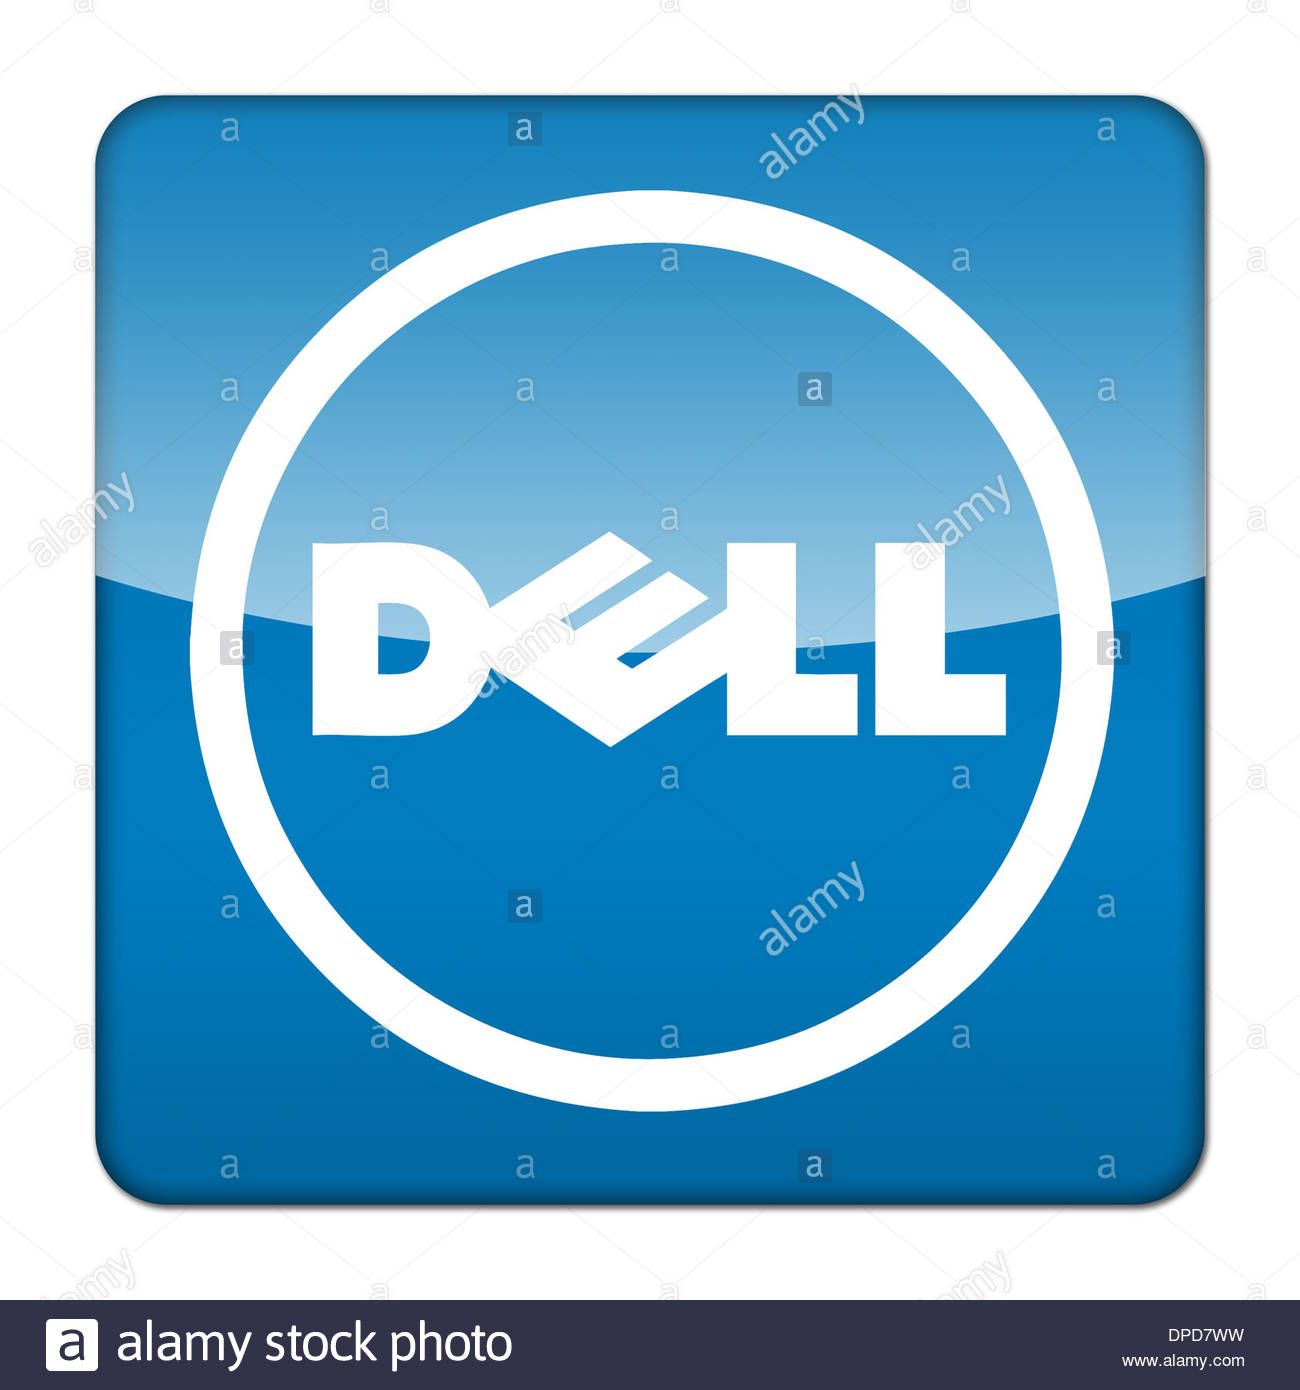 Dell logo stock photos dell logo stock images alamy dell computers logo icon app flag button stock image buycottarizona